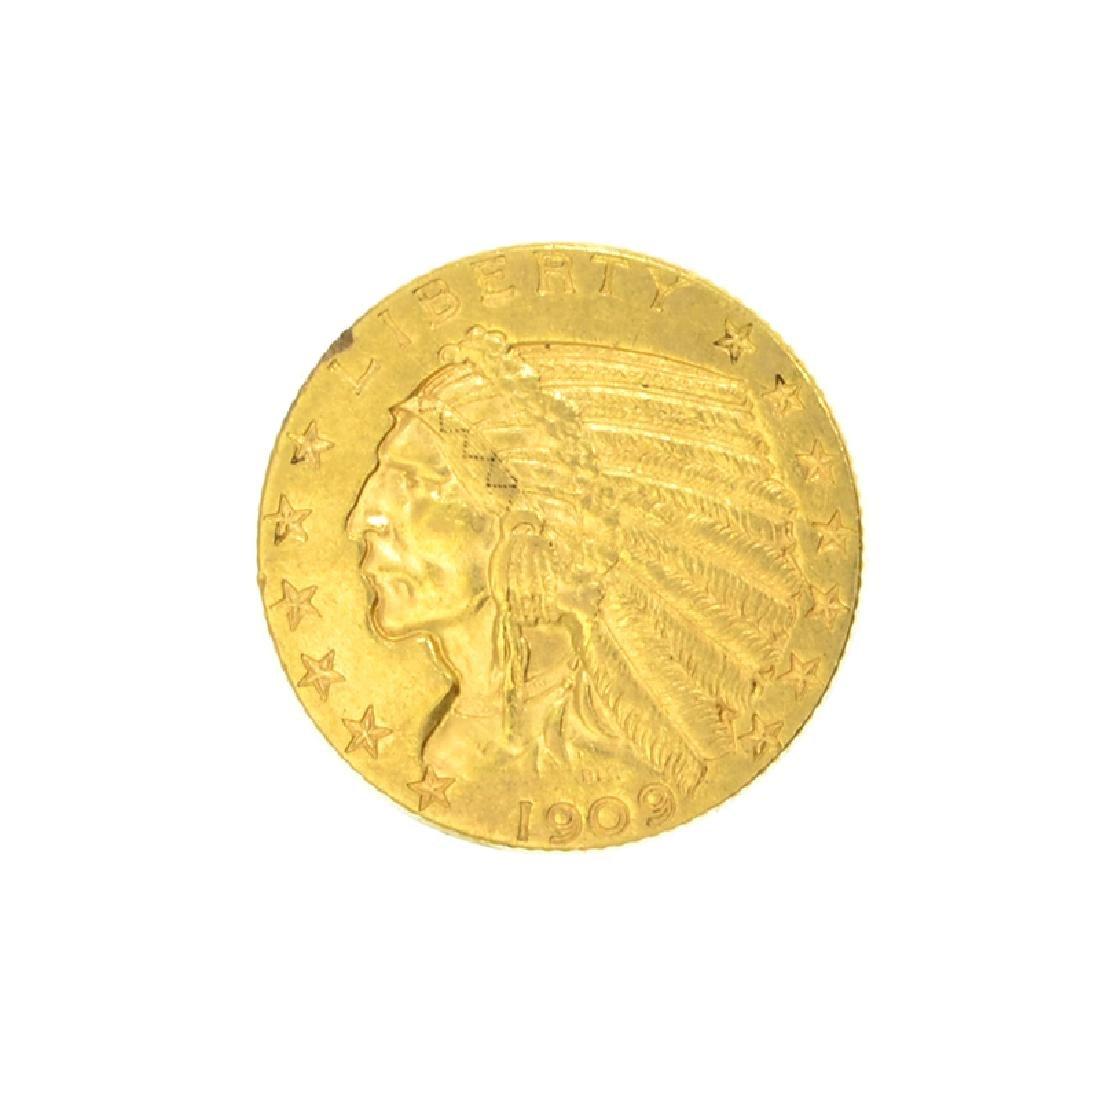 *1909-D $5 U.S. Indian Head Gold Coin (DF)